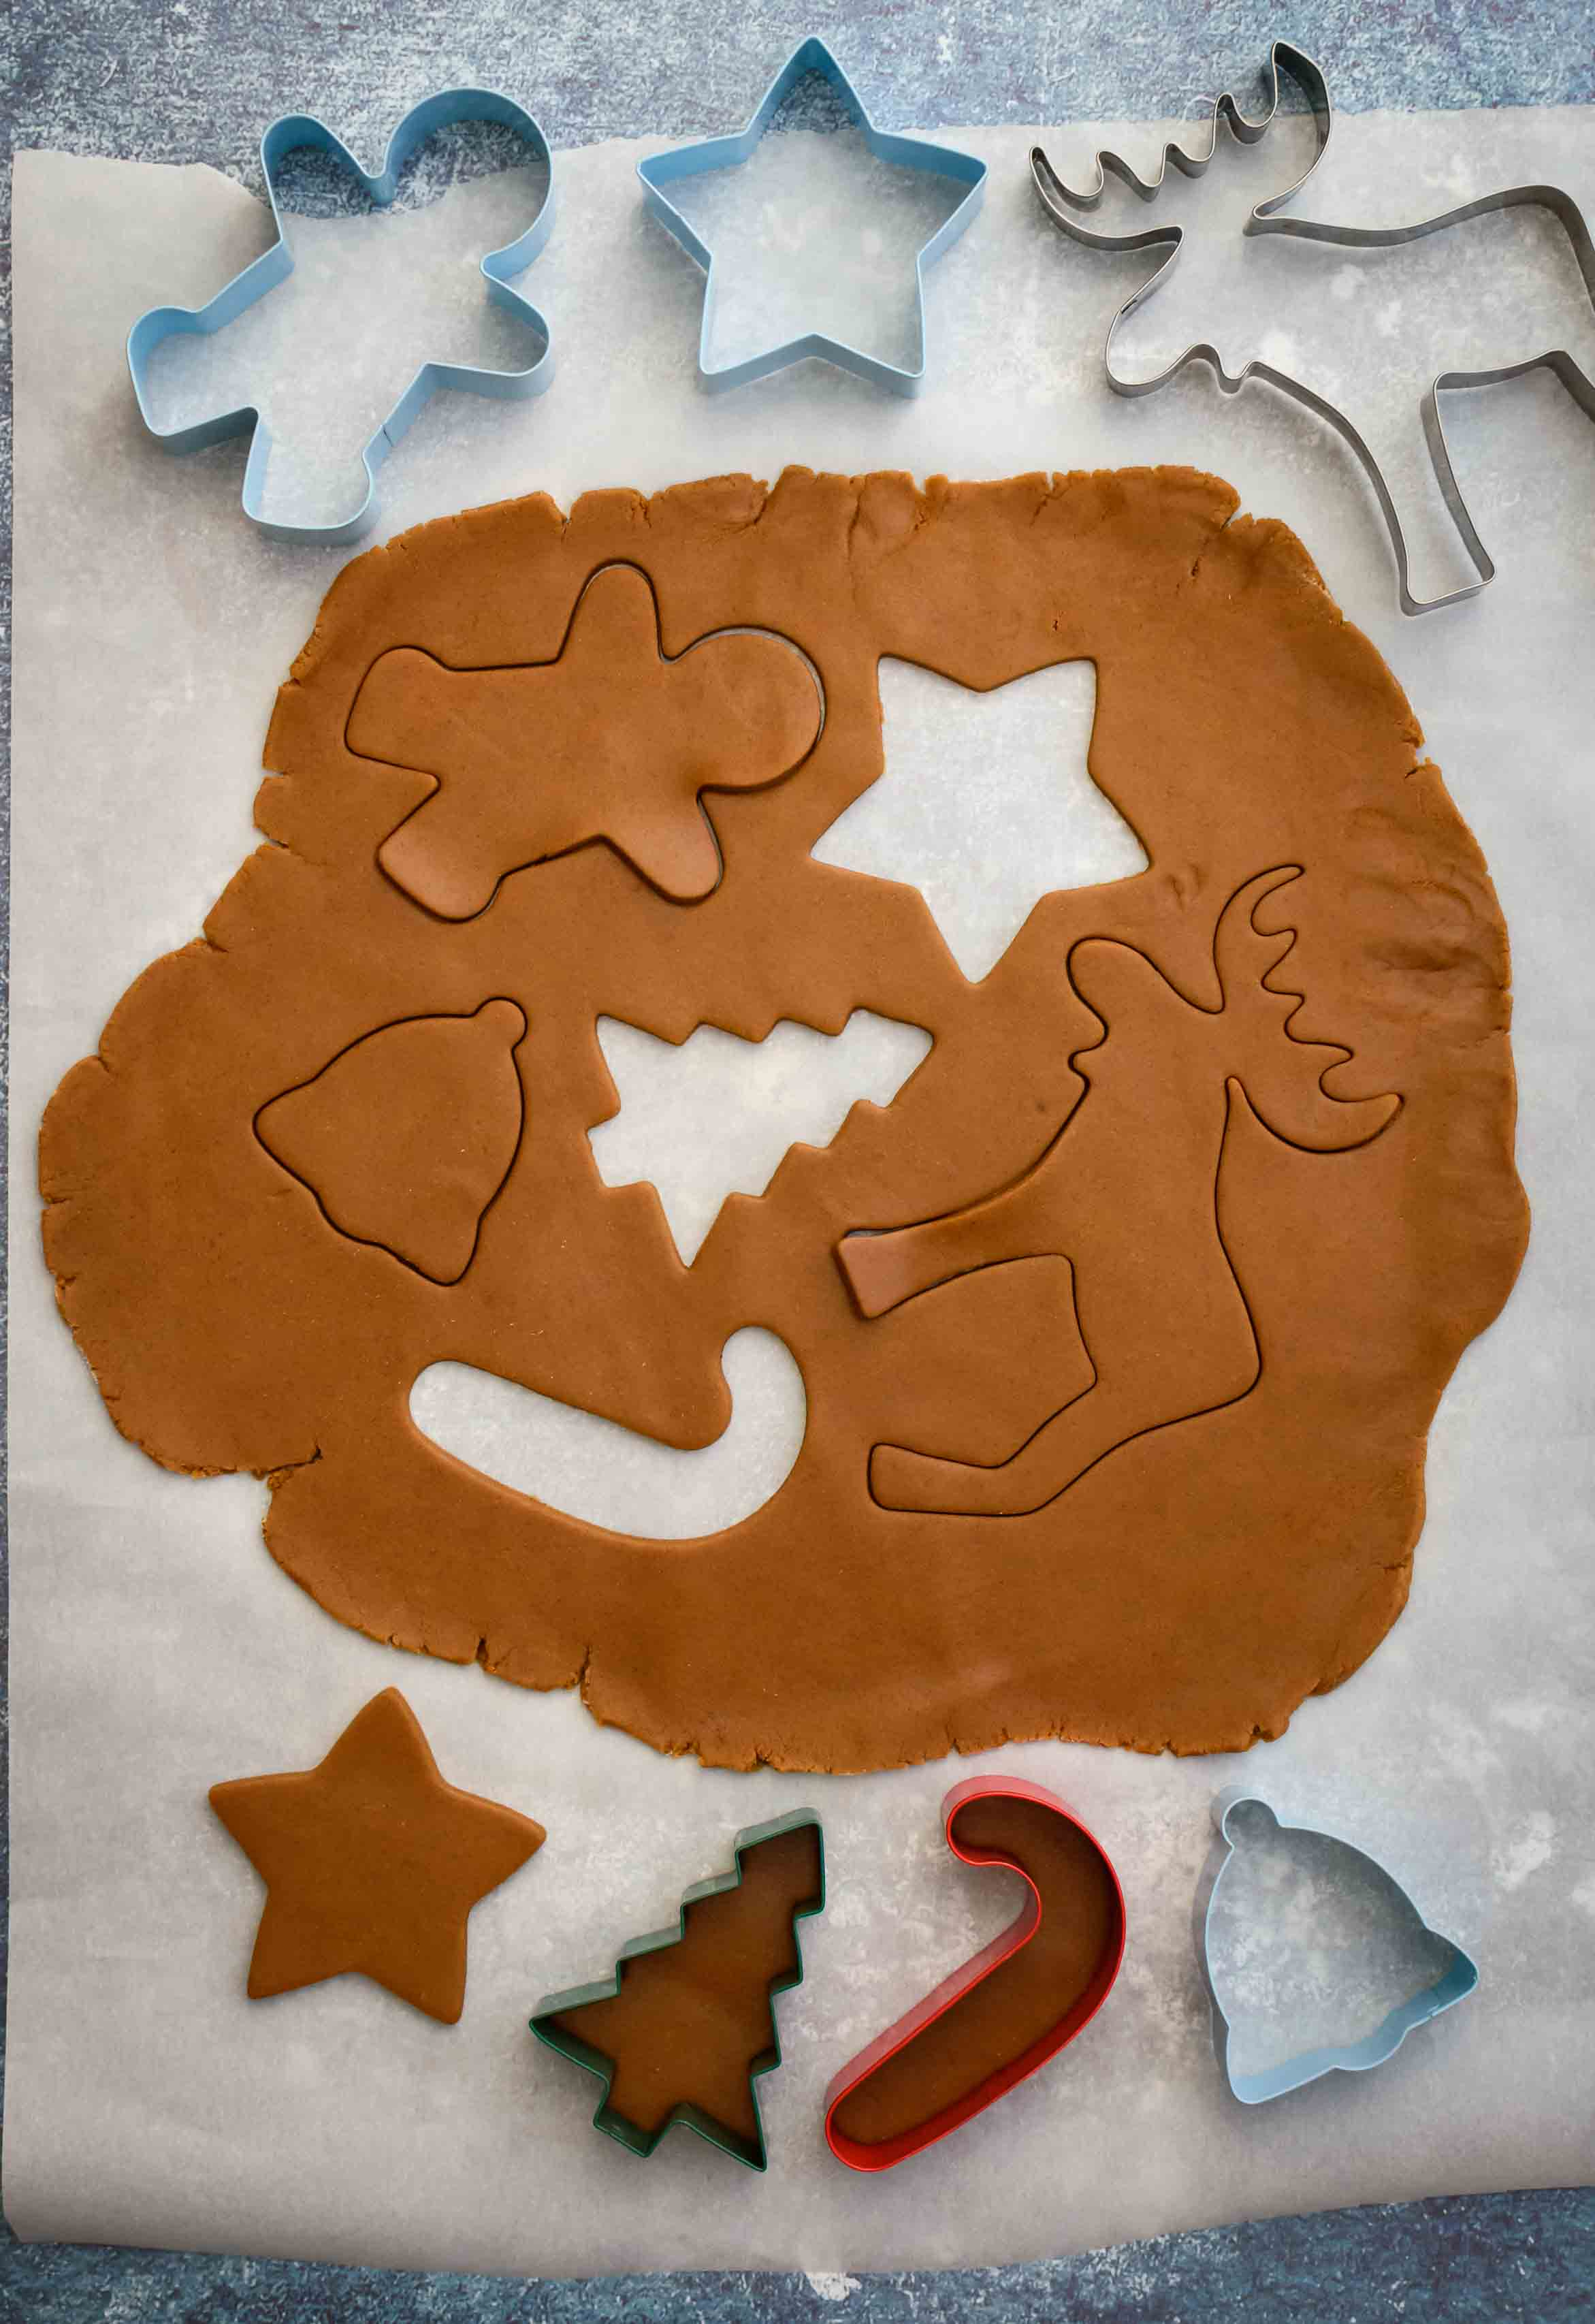 Gingerbread Cookies- Pepper Delight #pepperdelightblog #recipe #cookies #gingerbreadman #gingerbreadcookies #christmasdessert #christmascookies #gingerbread #christmas #snacks #baking #holidayrecipes #festiverecipes #bestgingerbreadmancookies